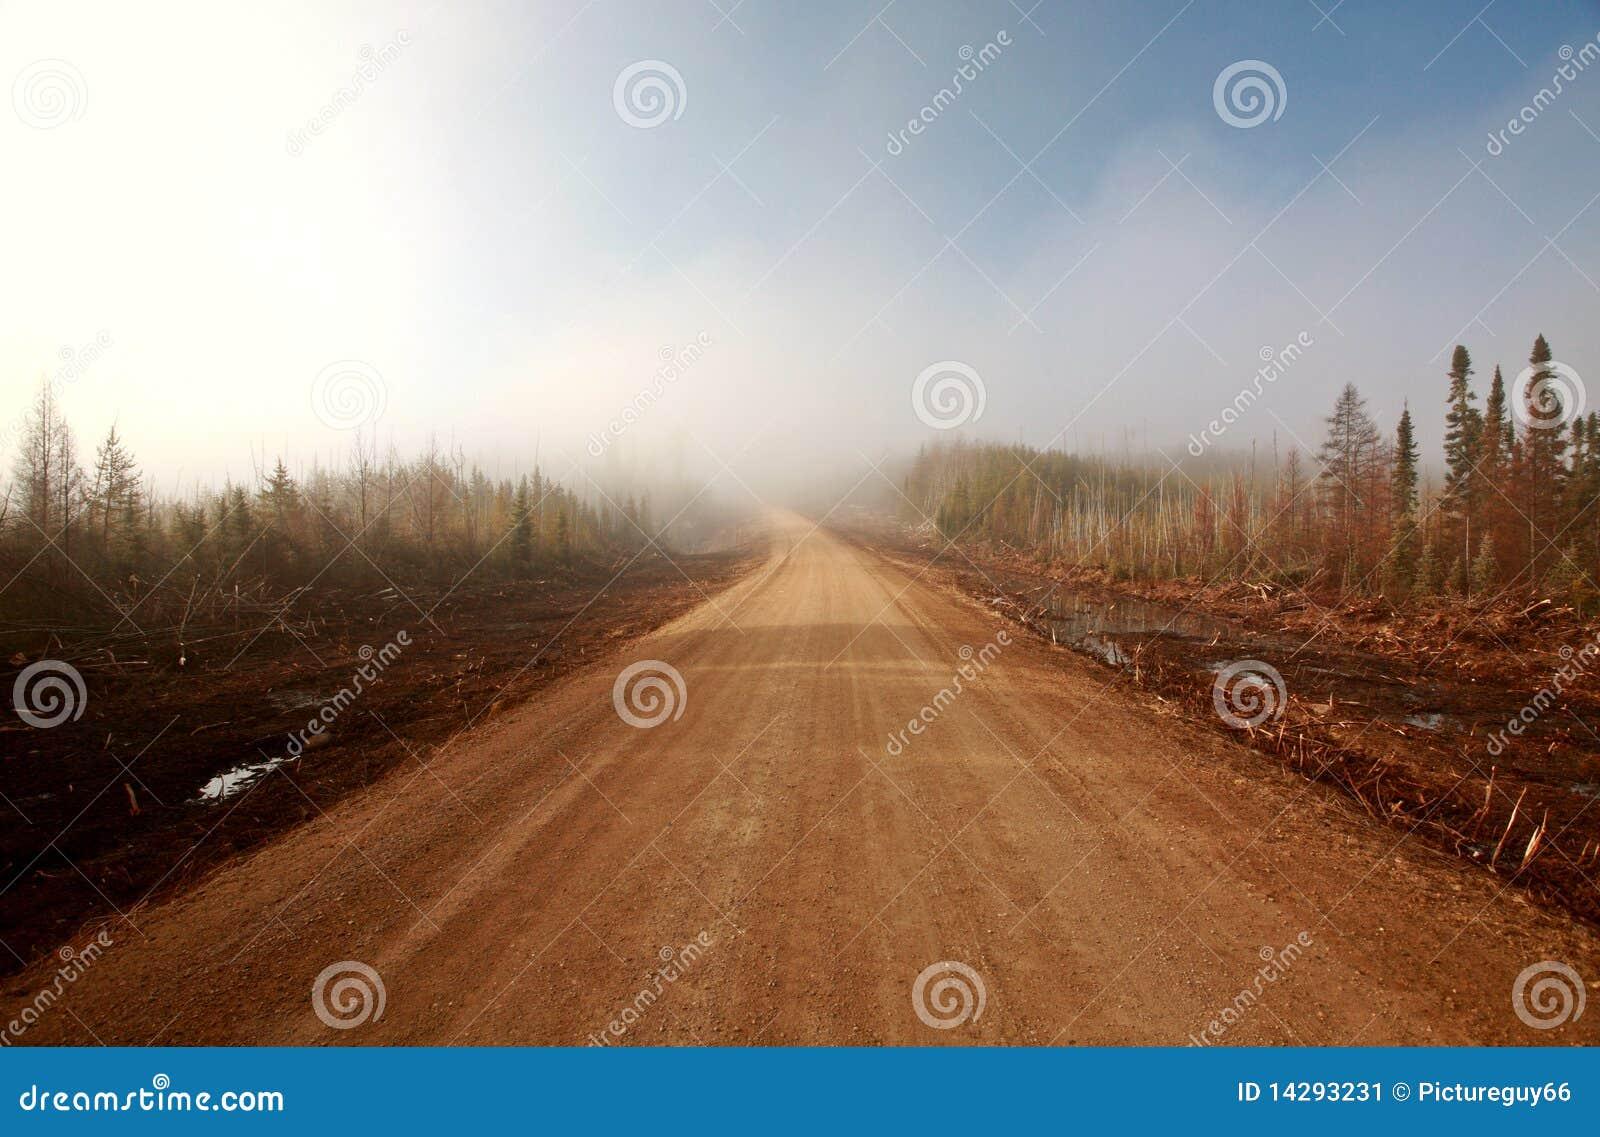 Stock image: misty morning road in spring saskatchewan